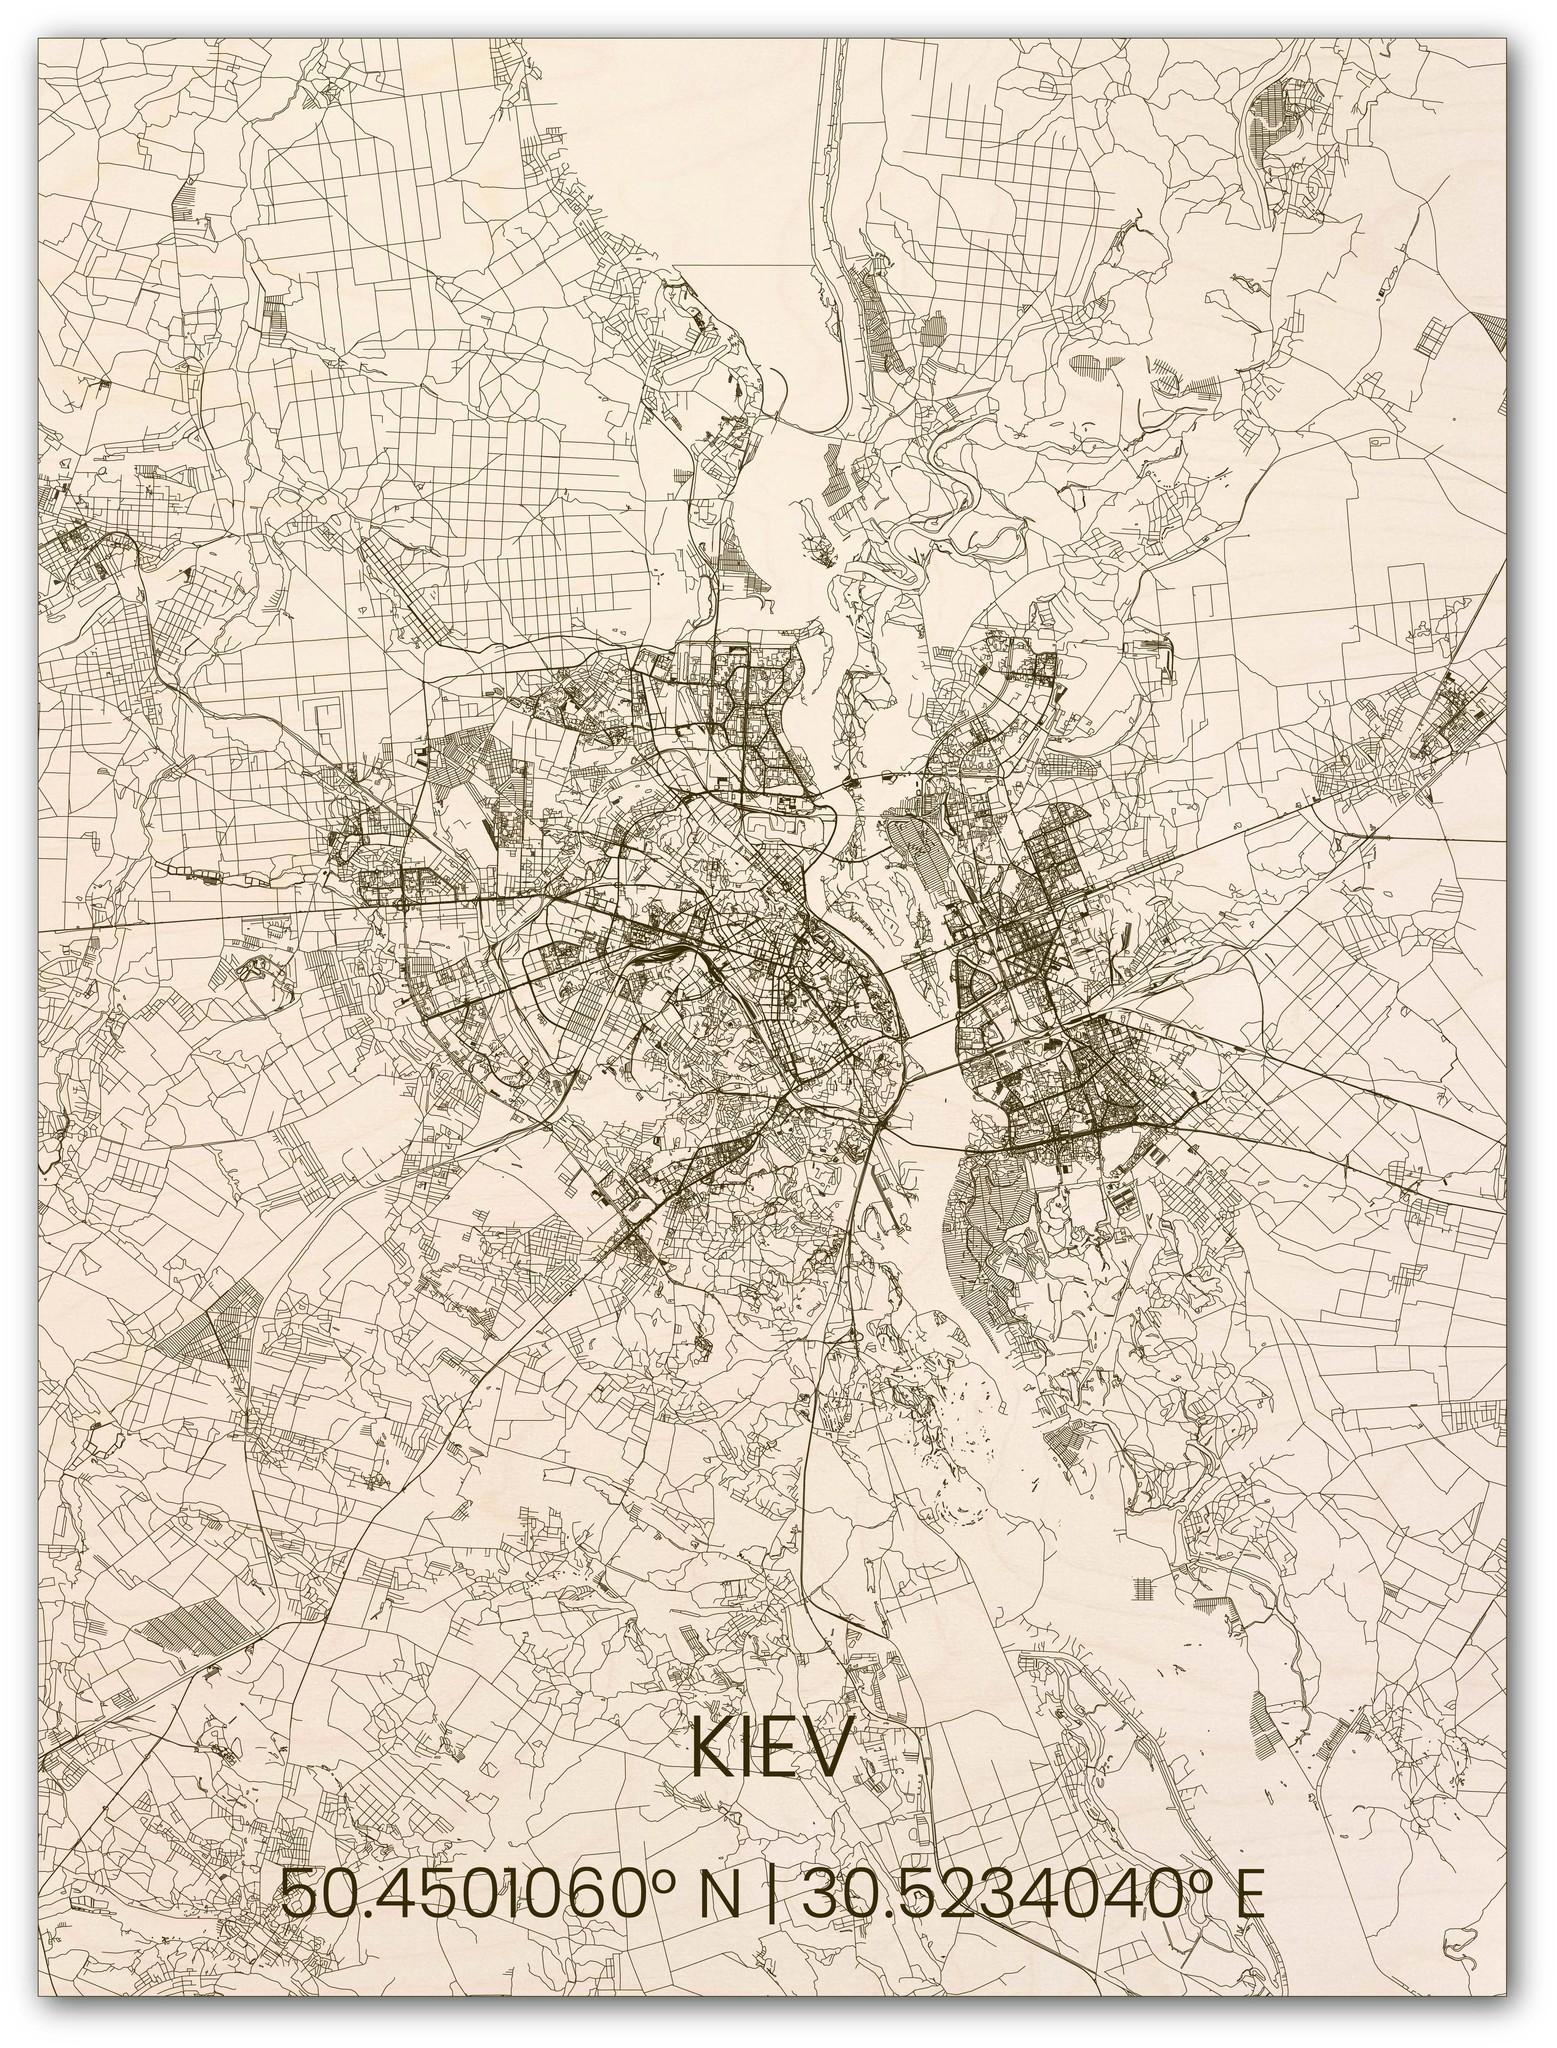 Houten stadsplattegrond Kiev-1